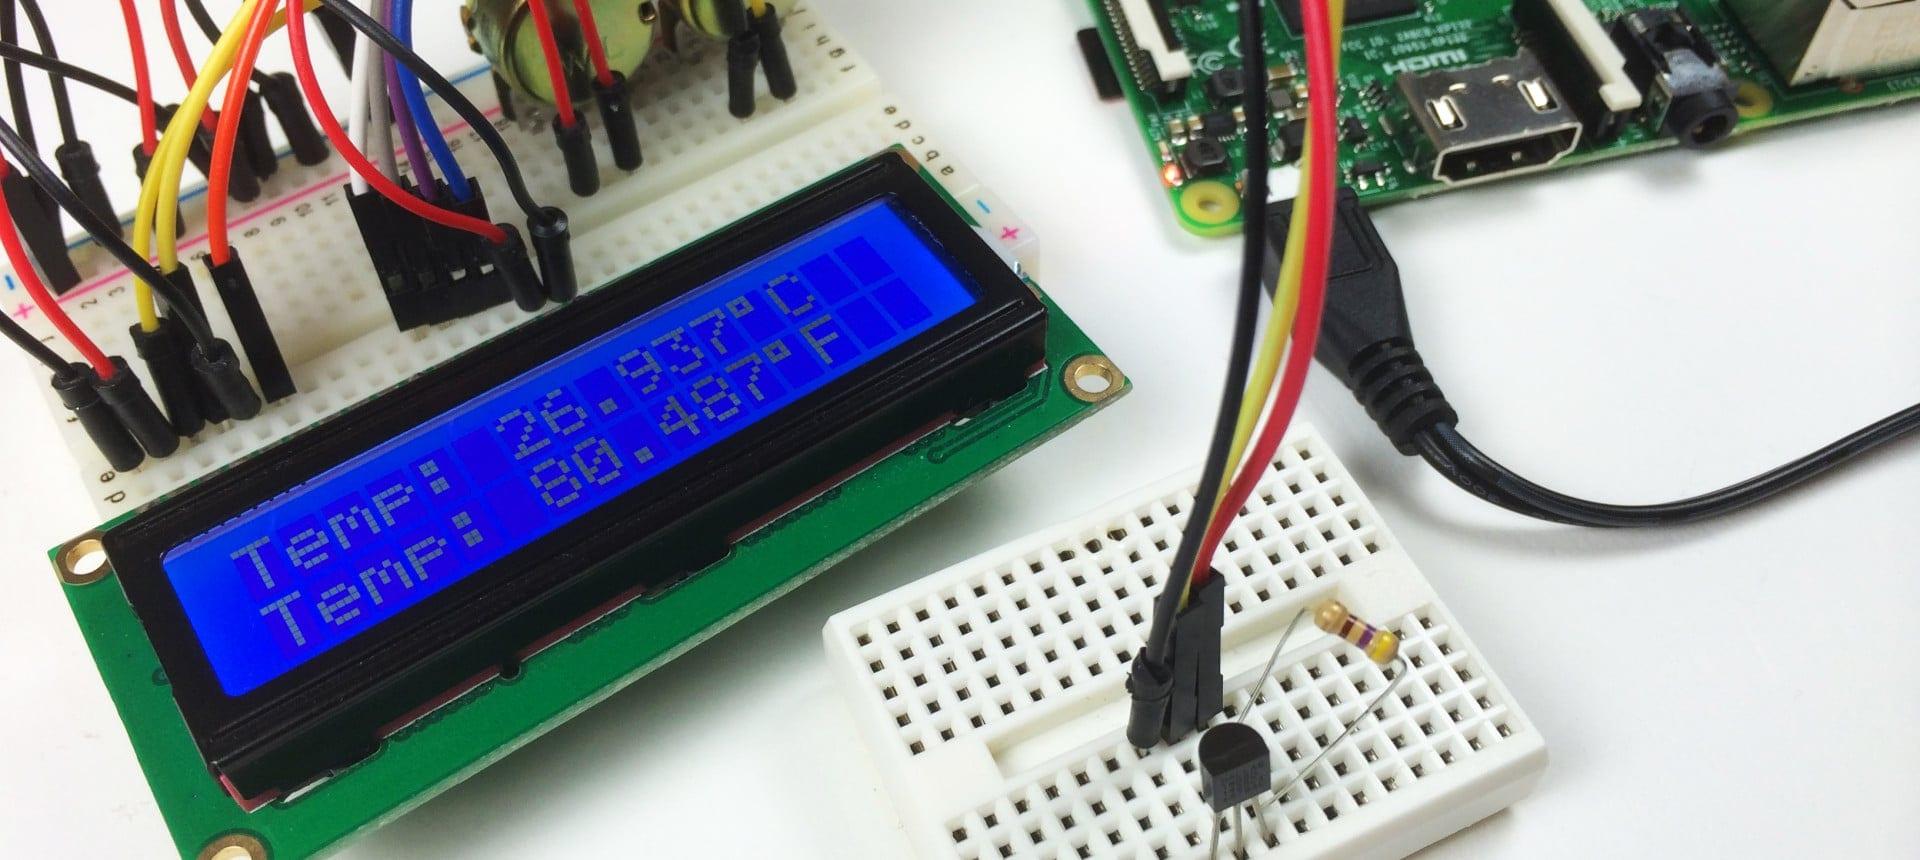 Raspberry Pi DS18B20 Temperature Sensor Tutorial - DS18B20 LCD Output